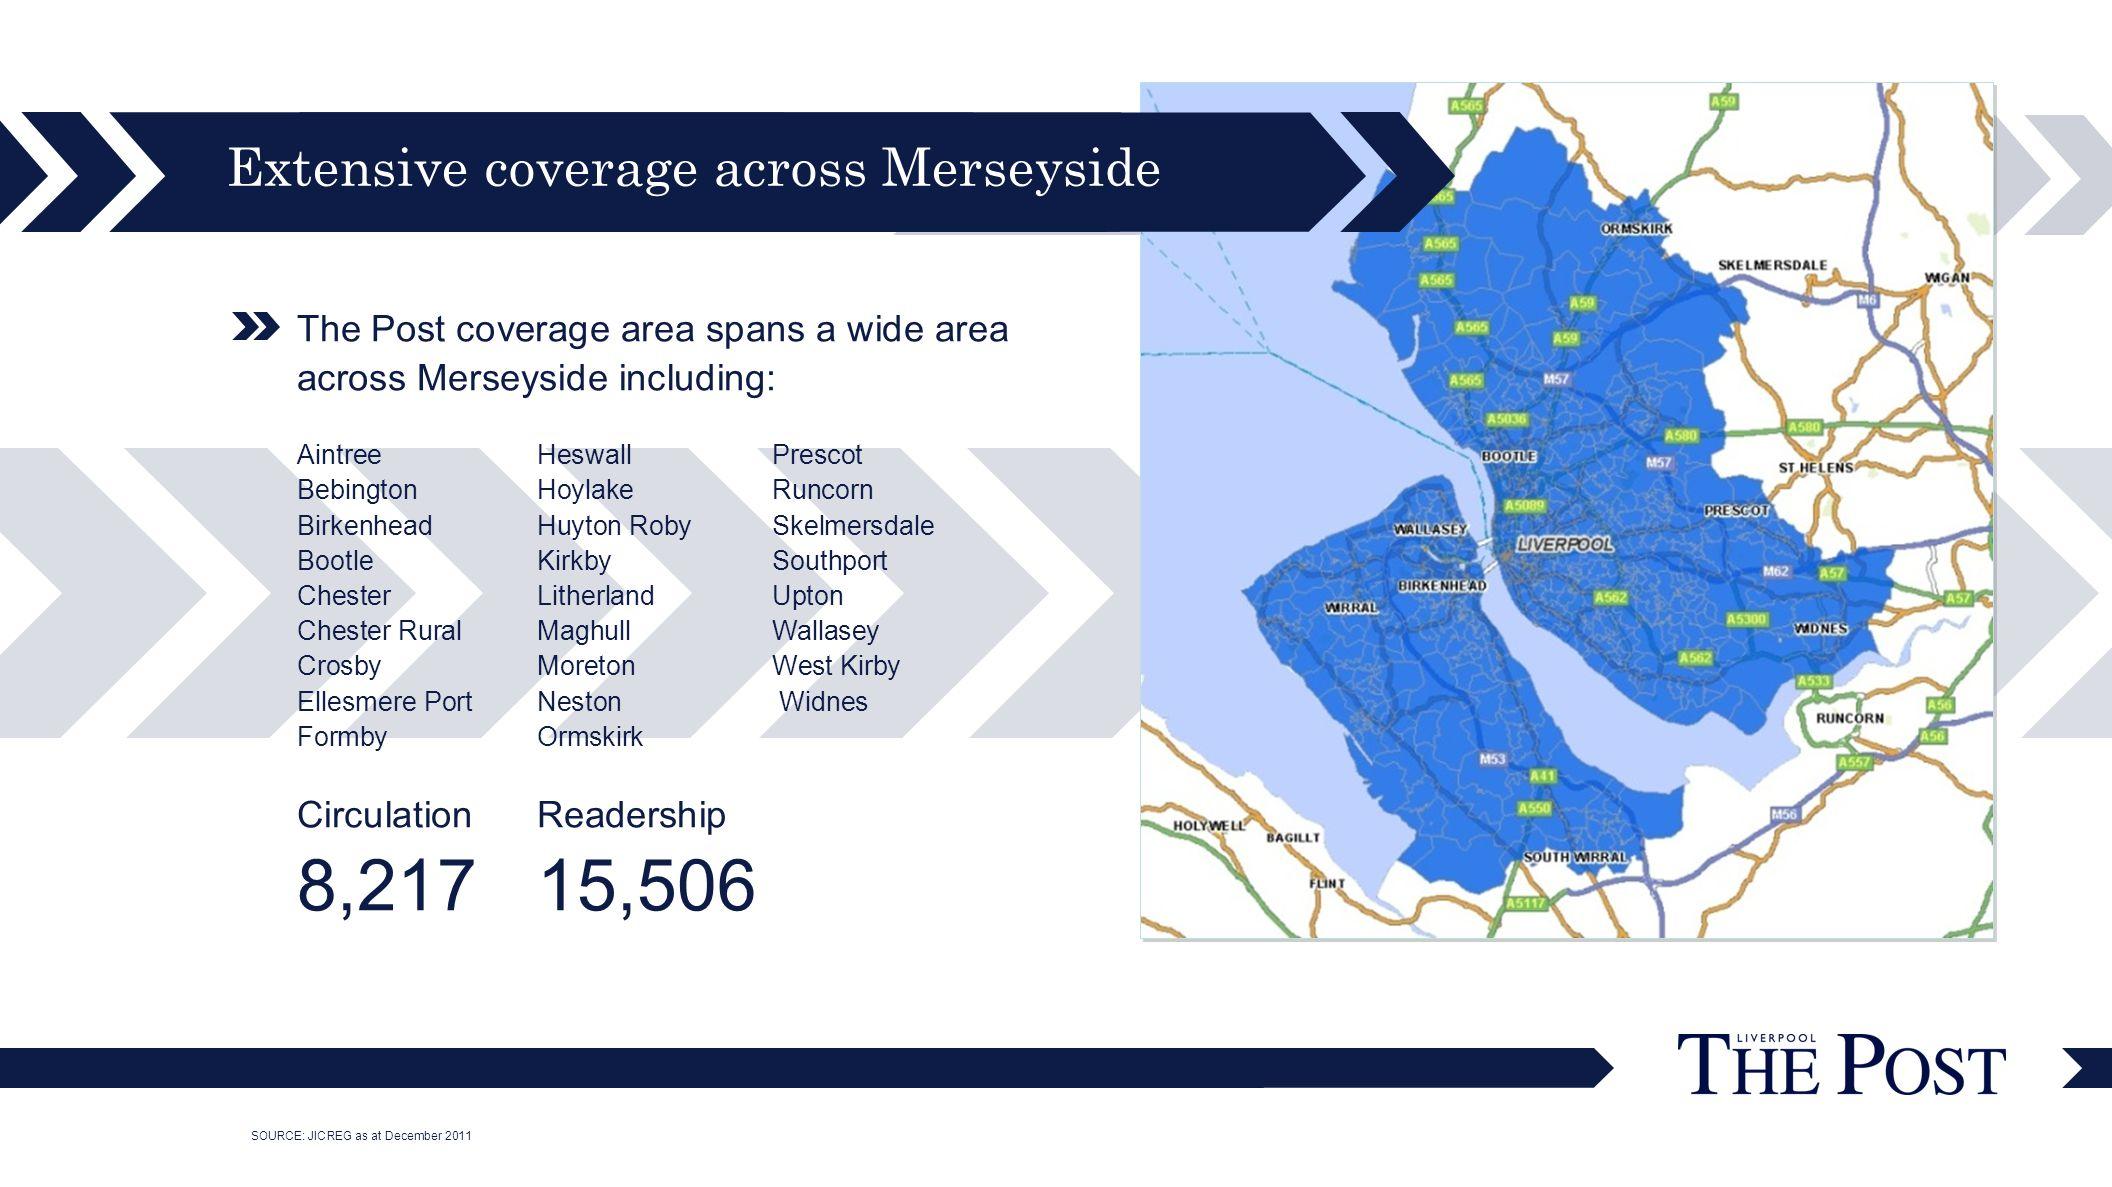 The Post coverage area spans a wide area across Merseyside including: AintreeHeswall Prescot BebingtonHoylakeRuncorn BirkenheadHuyton RobySkelmersdale BootleKirkbySouthport ChesterLitherlandUpton Chester RuralMaghullWallasey CrosbyMoretonWest Kirby Ellesmere PortNeston Widnes FormbyOrmskirk CirculationReadership 8,21715,506 Extensive coverage across Merseyside SOURCE: JICREG as at December 2011